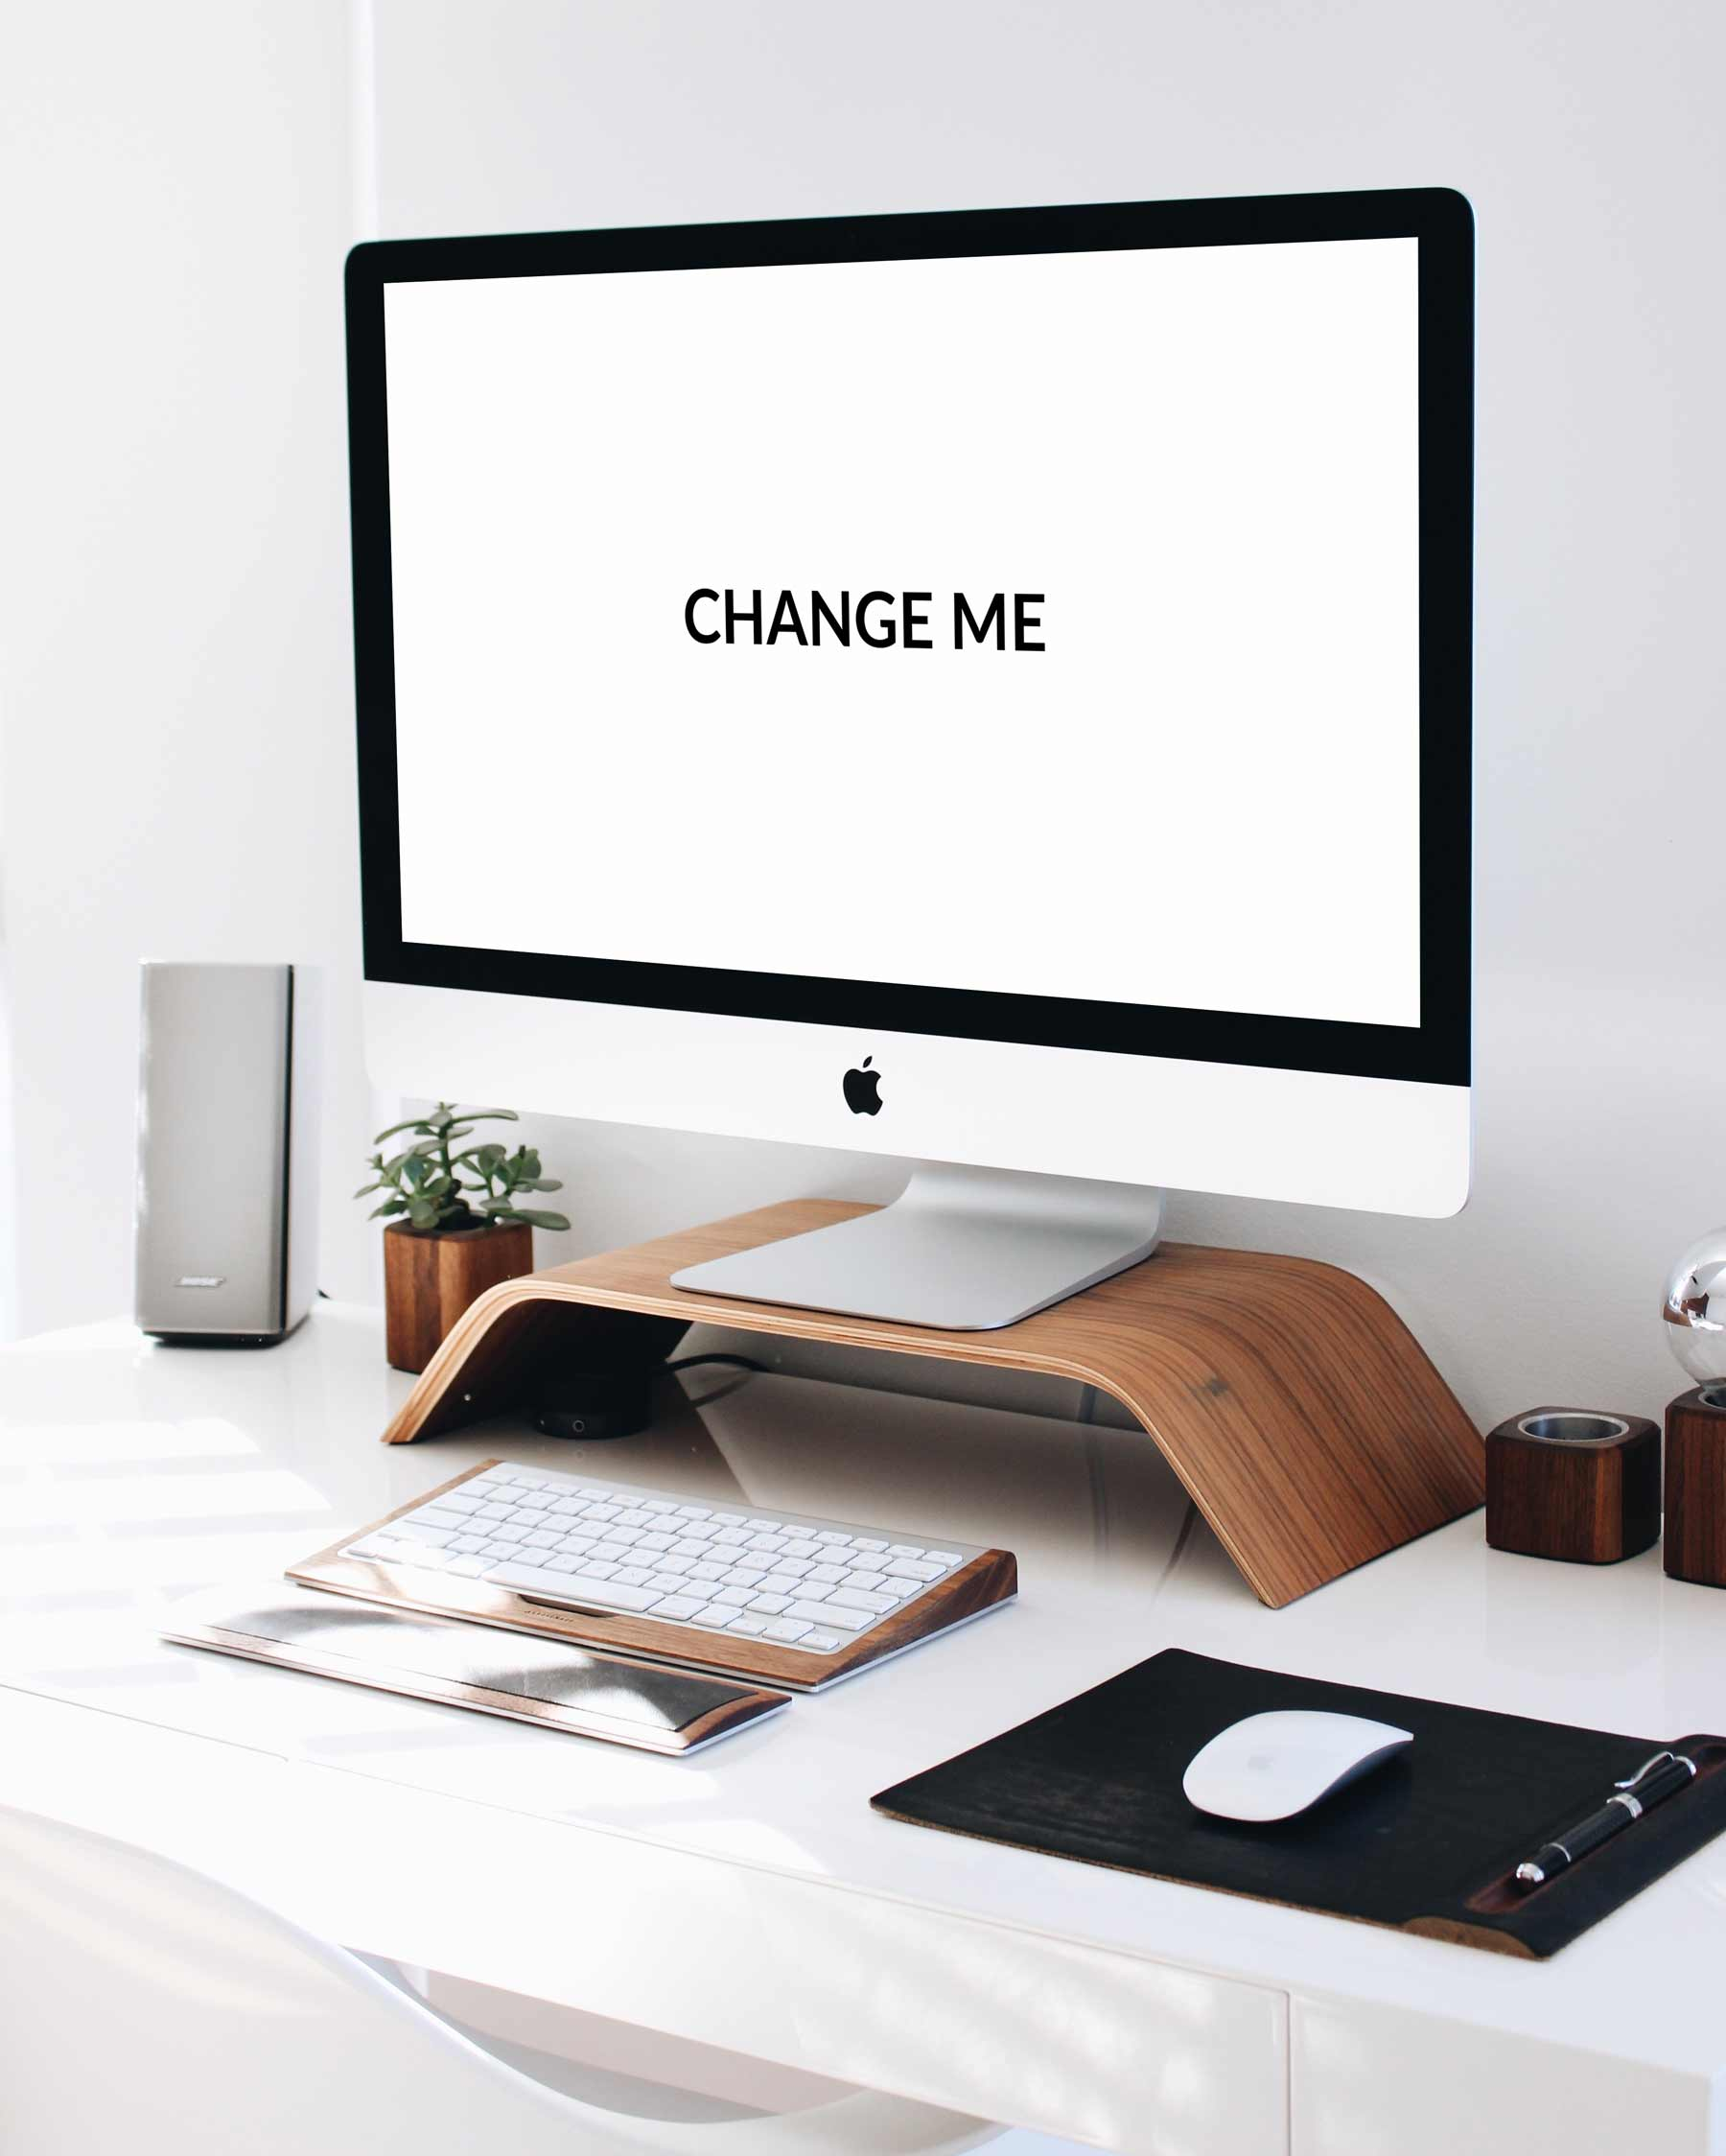 Clean Minimalist Desk iMac Mockup Conor Lyons